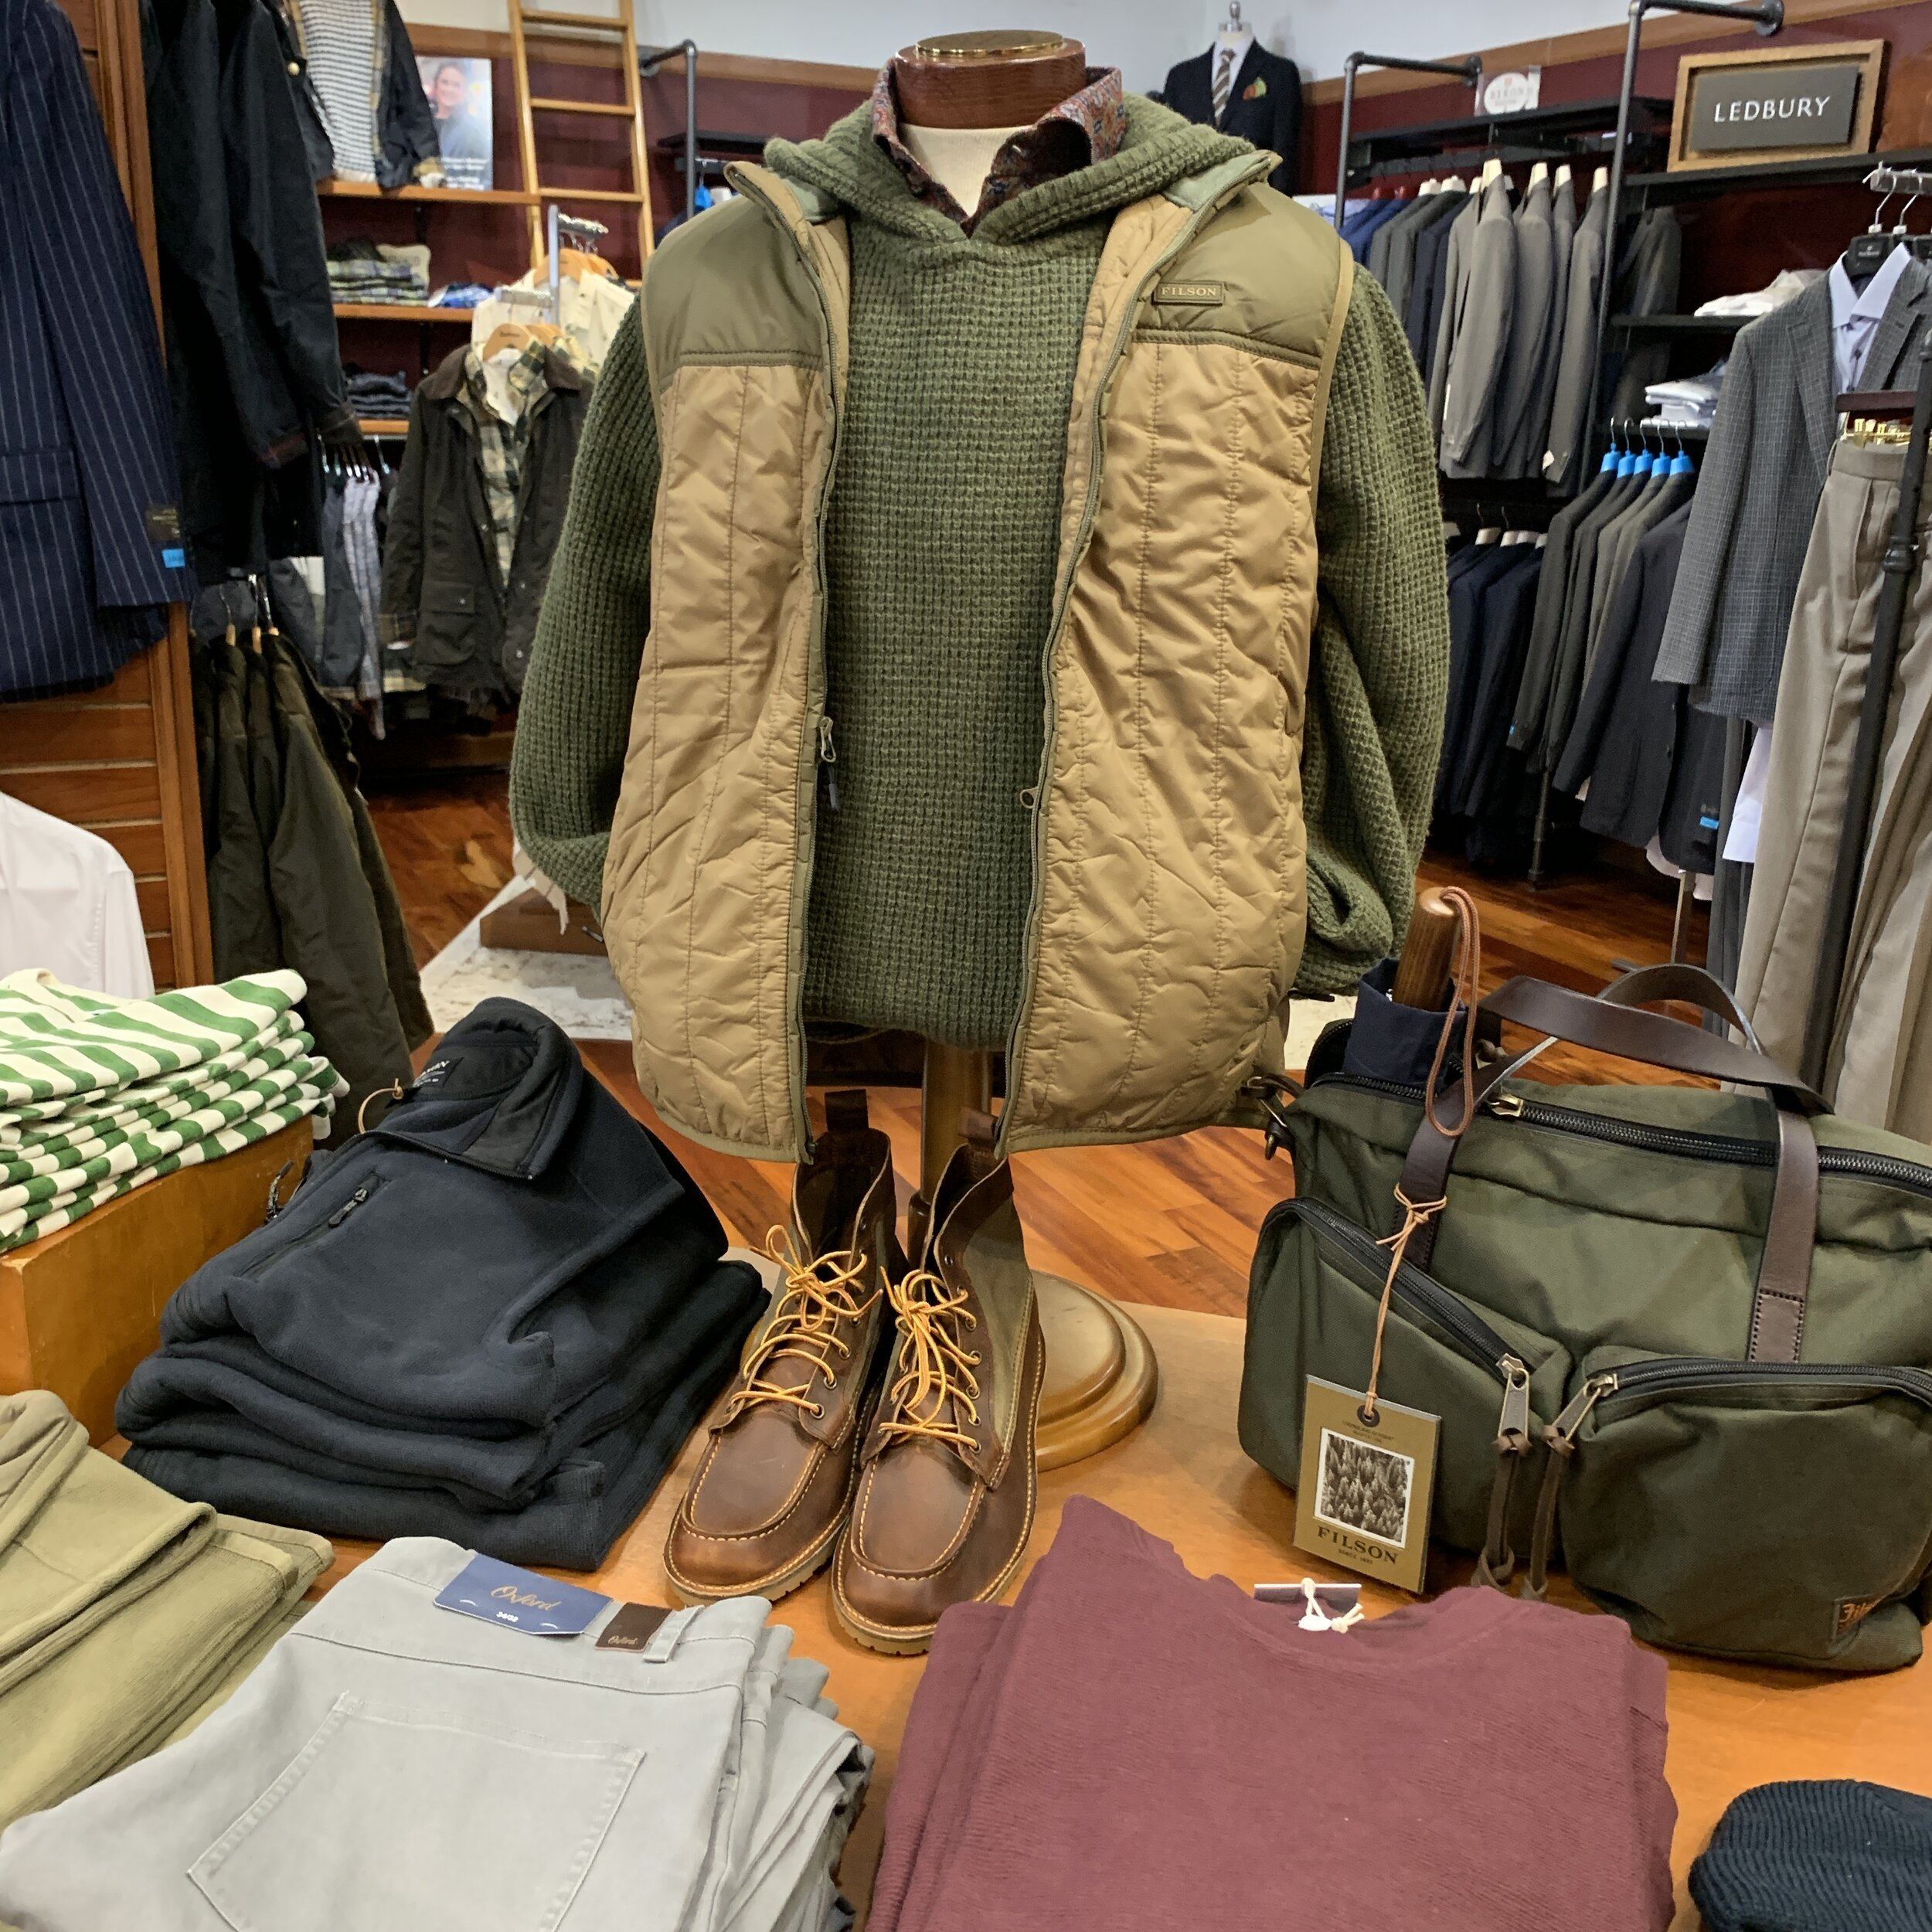 Filson Vest, Banks Journal Waffle Weave Hoodie, Stenströms Sportshirt, Redwing boots